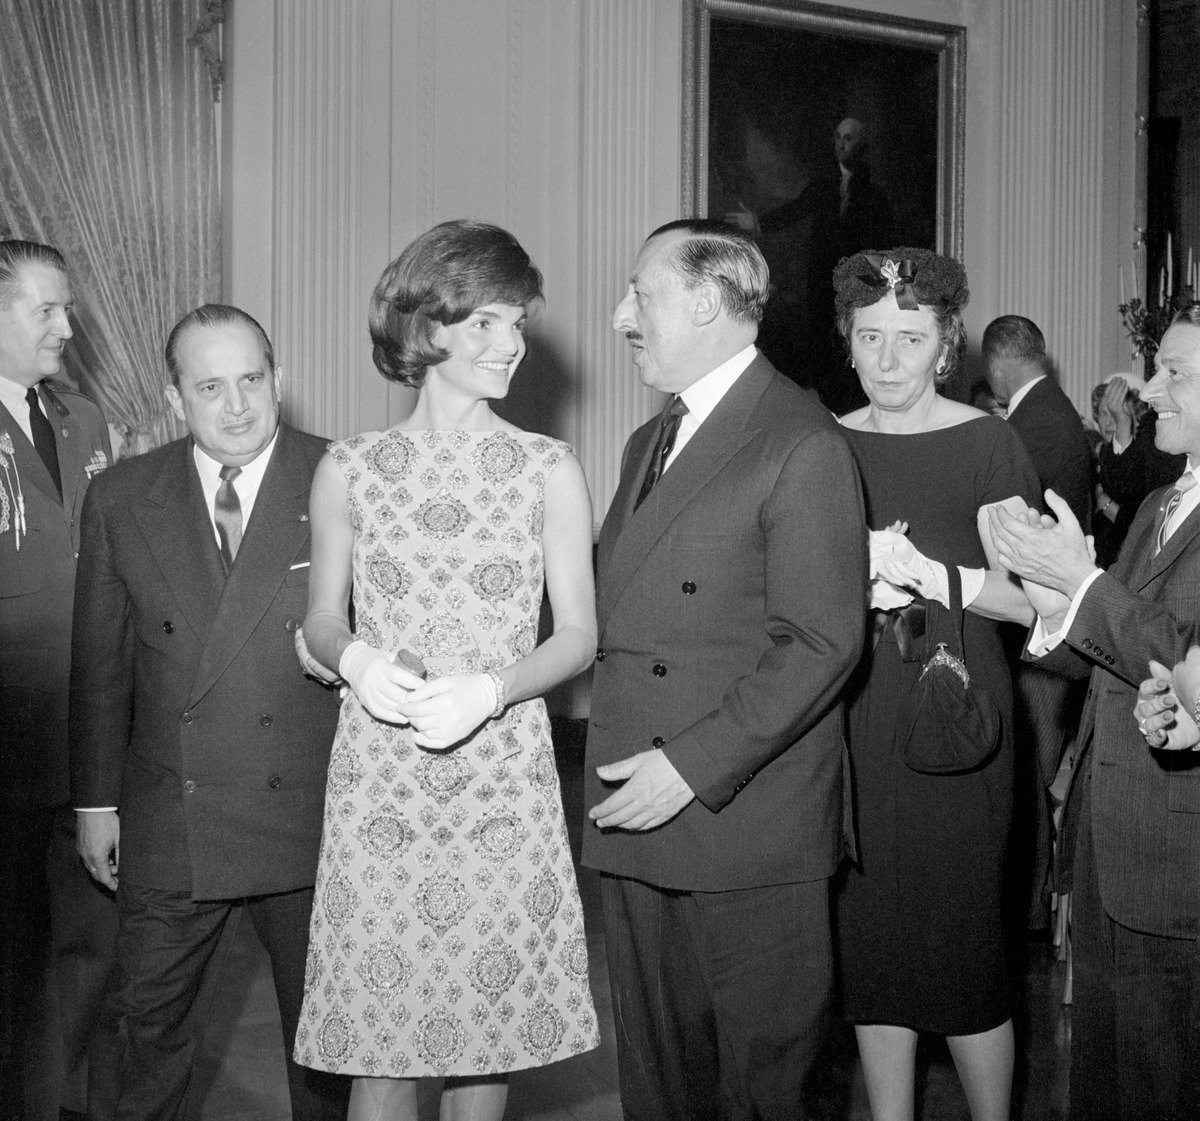 Уроки стиля от первой леди США - Жаклин Кеннеди